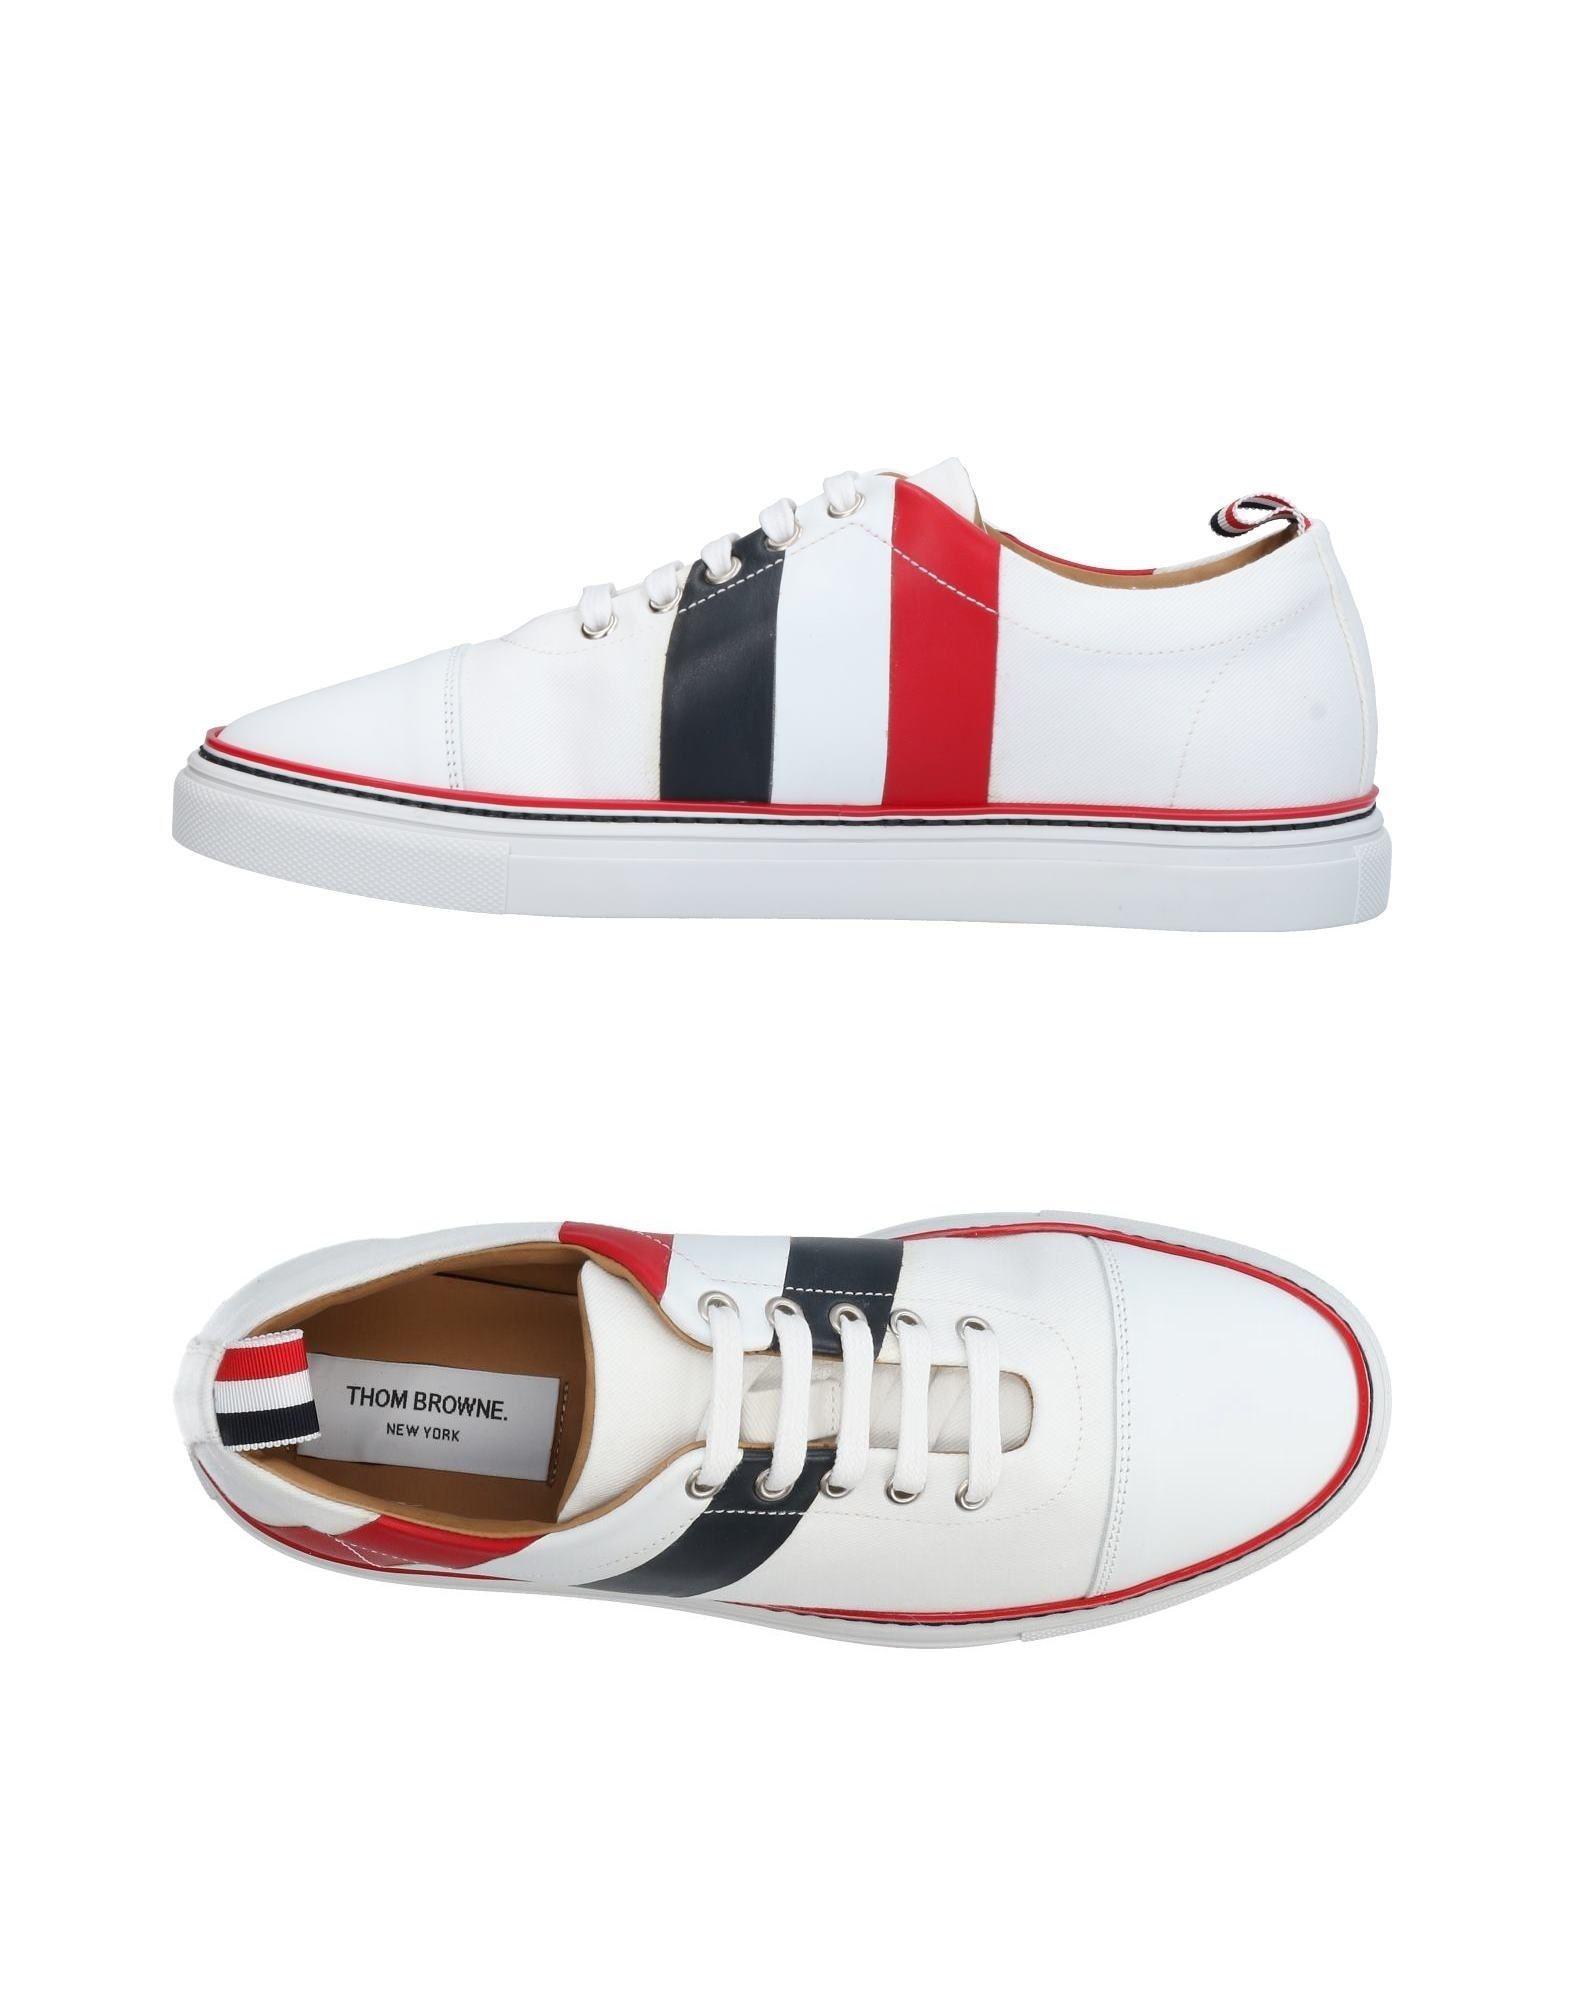 Thom Browne Sneakers Herren  11434654NB Gute Qualität beliebte Schuhe